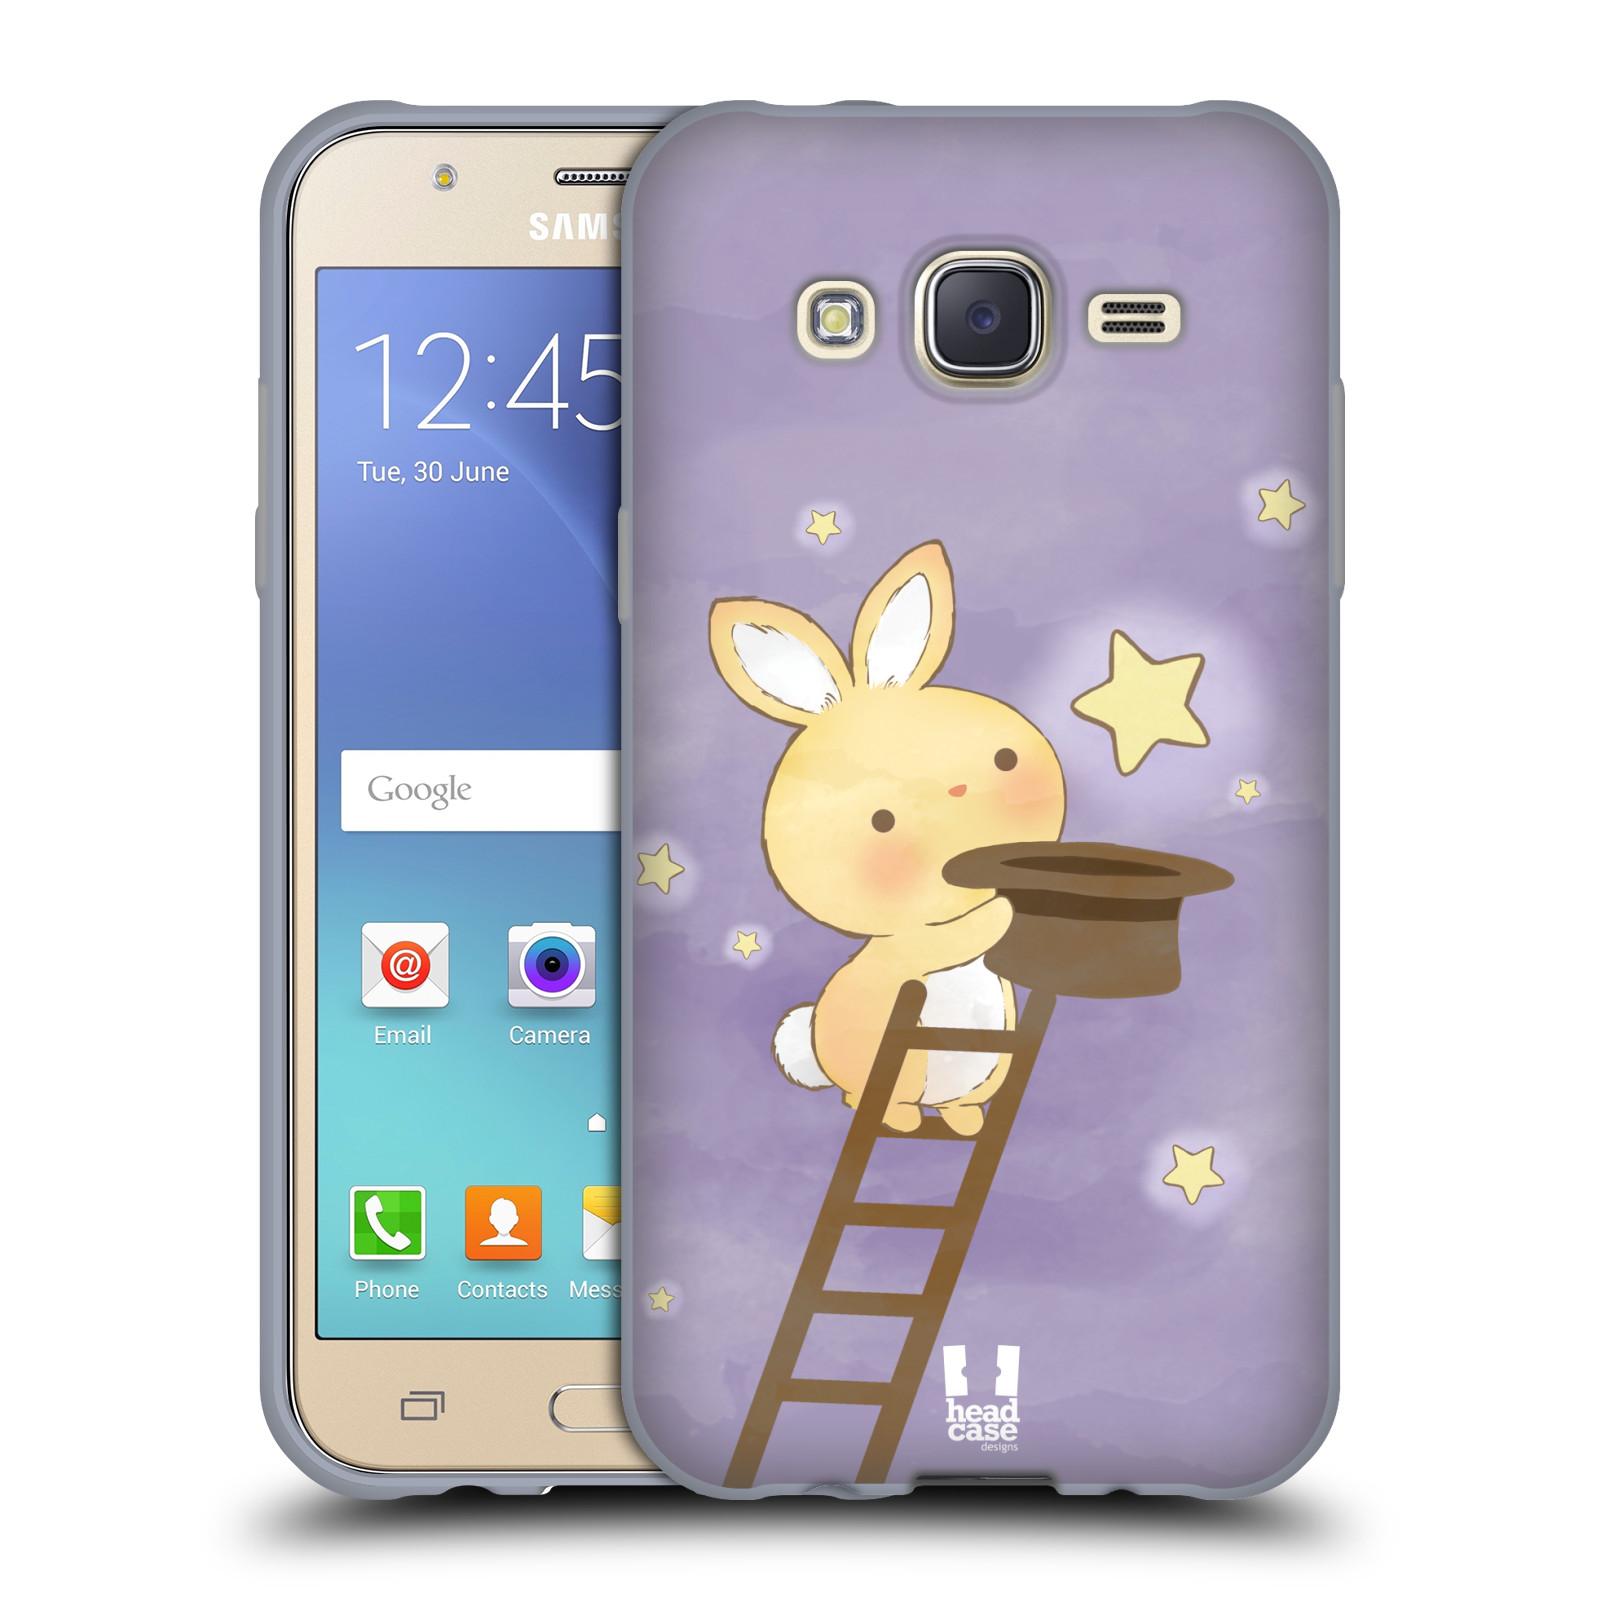 HEAD CASE silikonový obal na mobil Samsung Galaxy J5, J500, (J5 DUOS) vzor králíček a hvězdy fialová